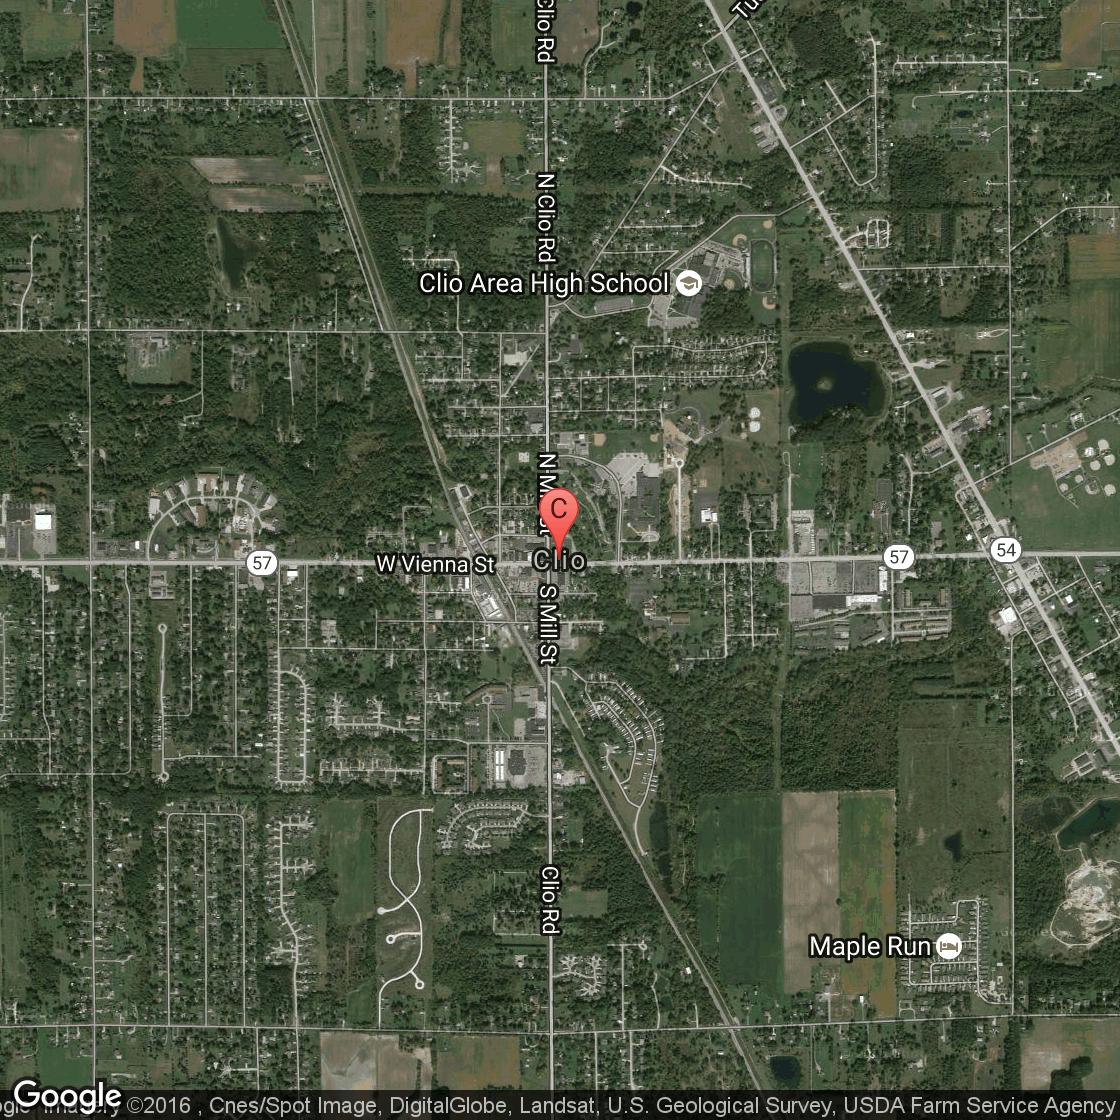 Michigan genesee county clio - Michigan Genesee County Clio 70